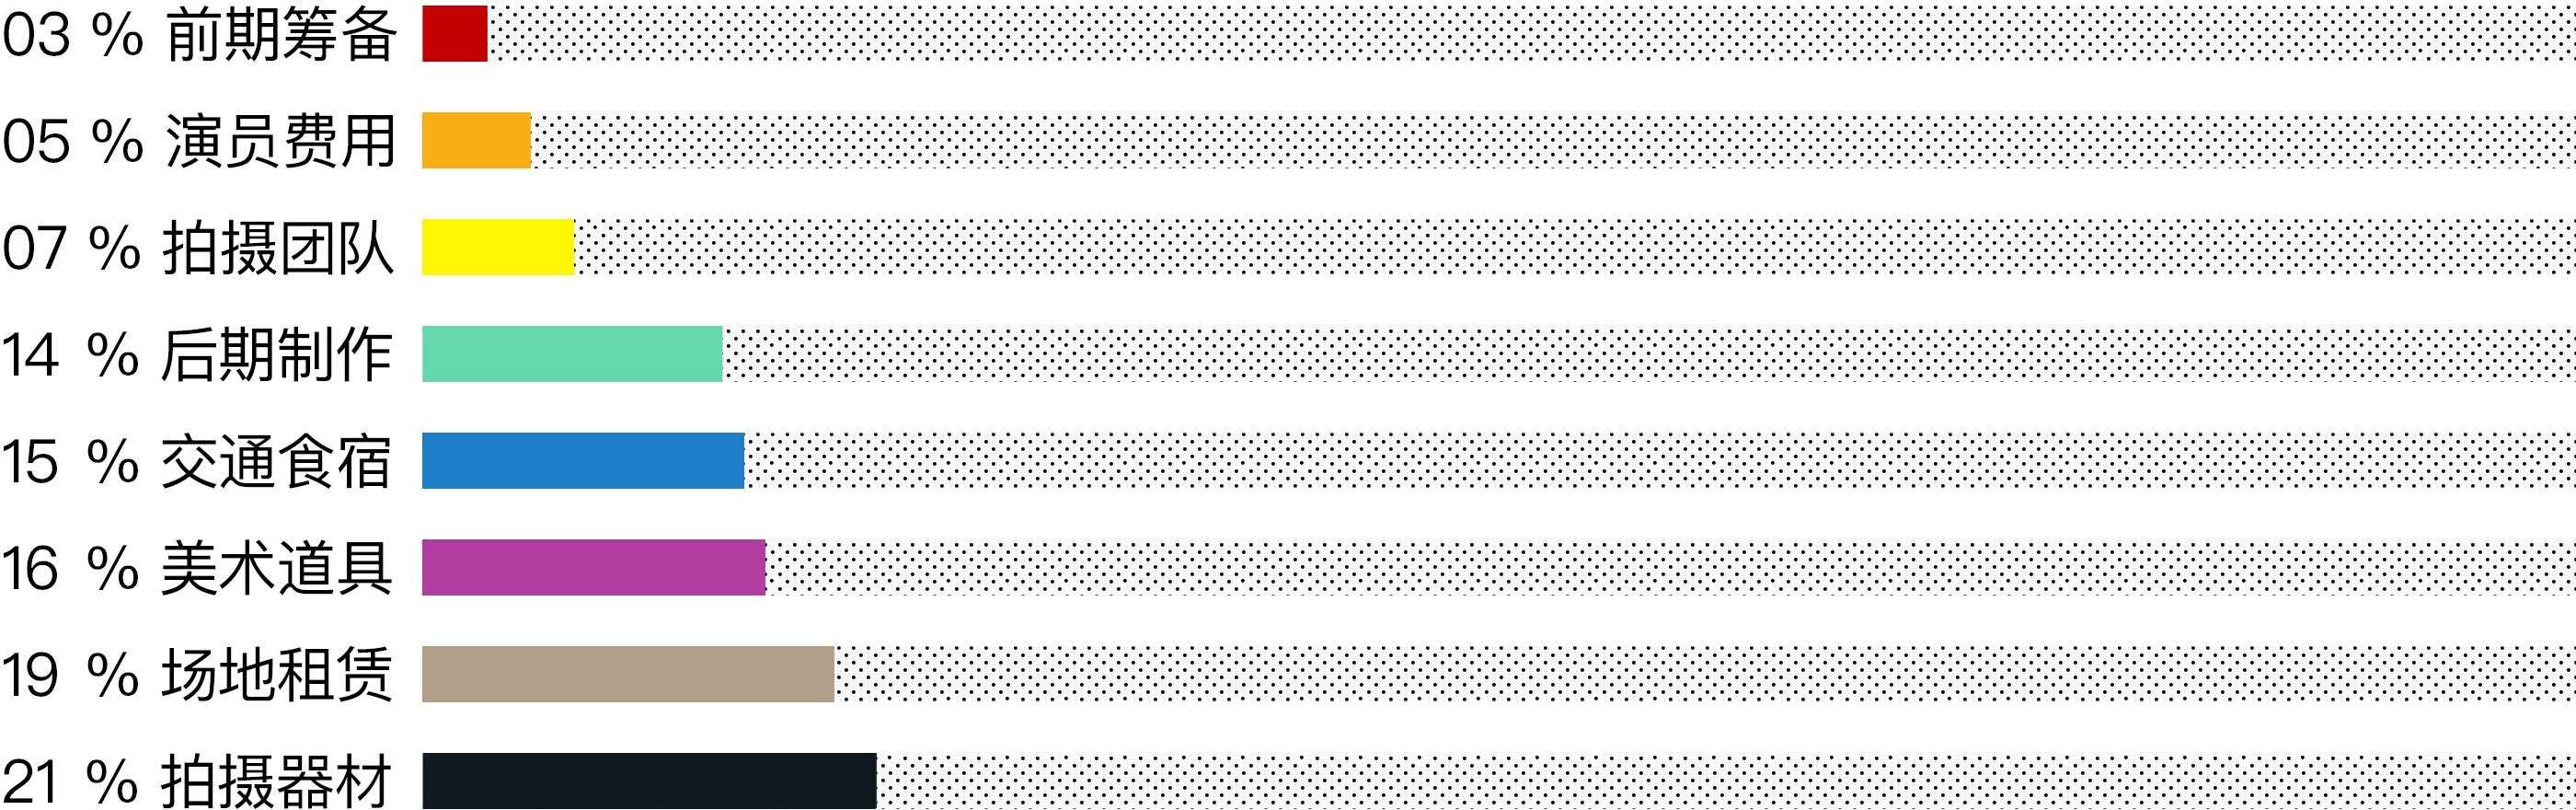 Qizhe-众筹-条形图.jpg